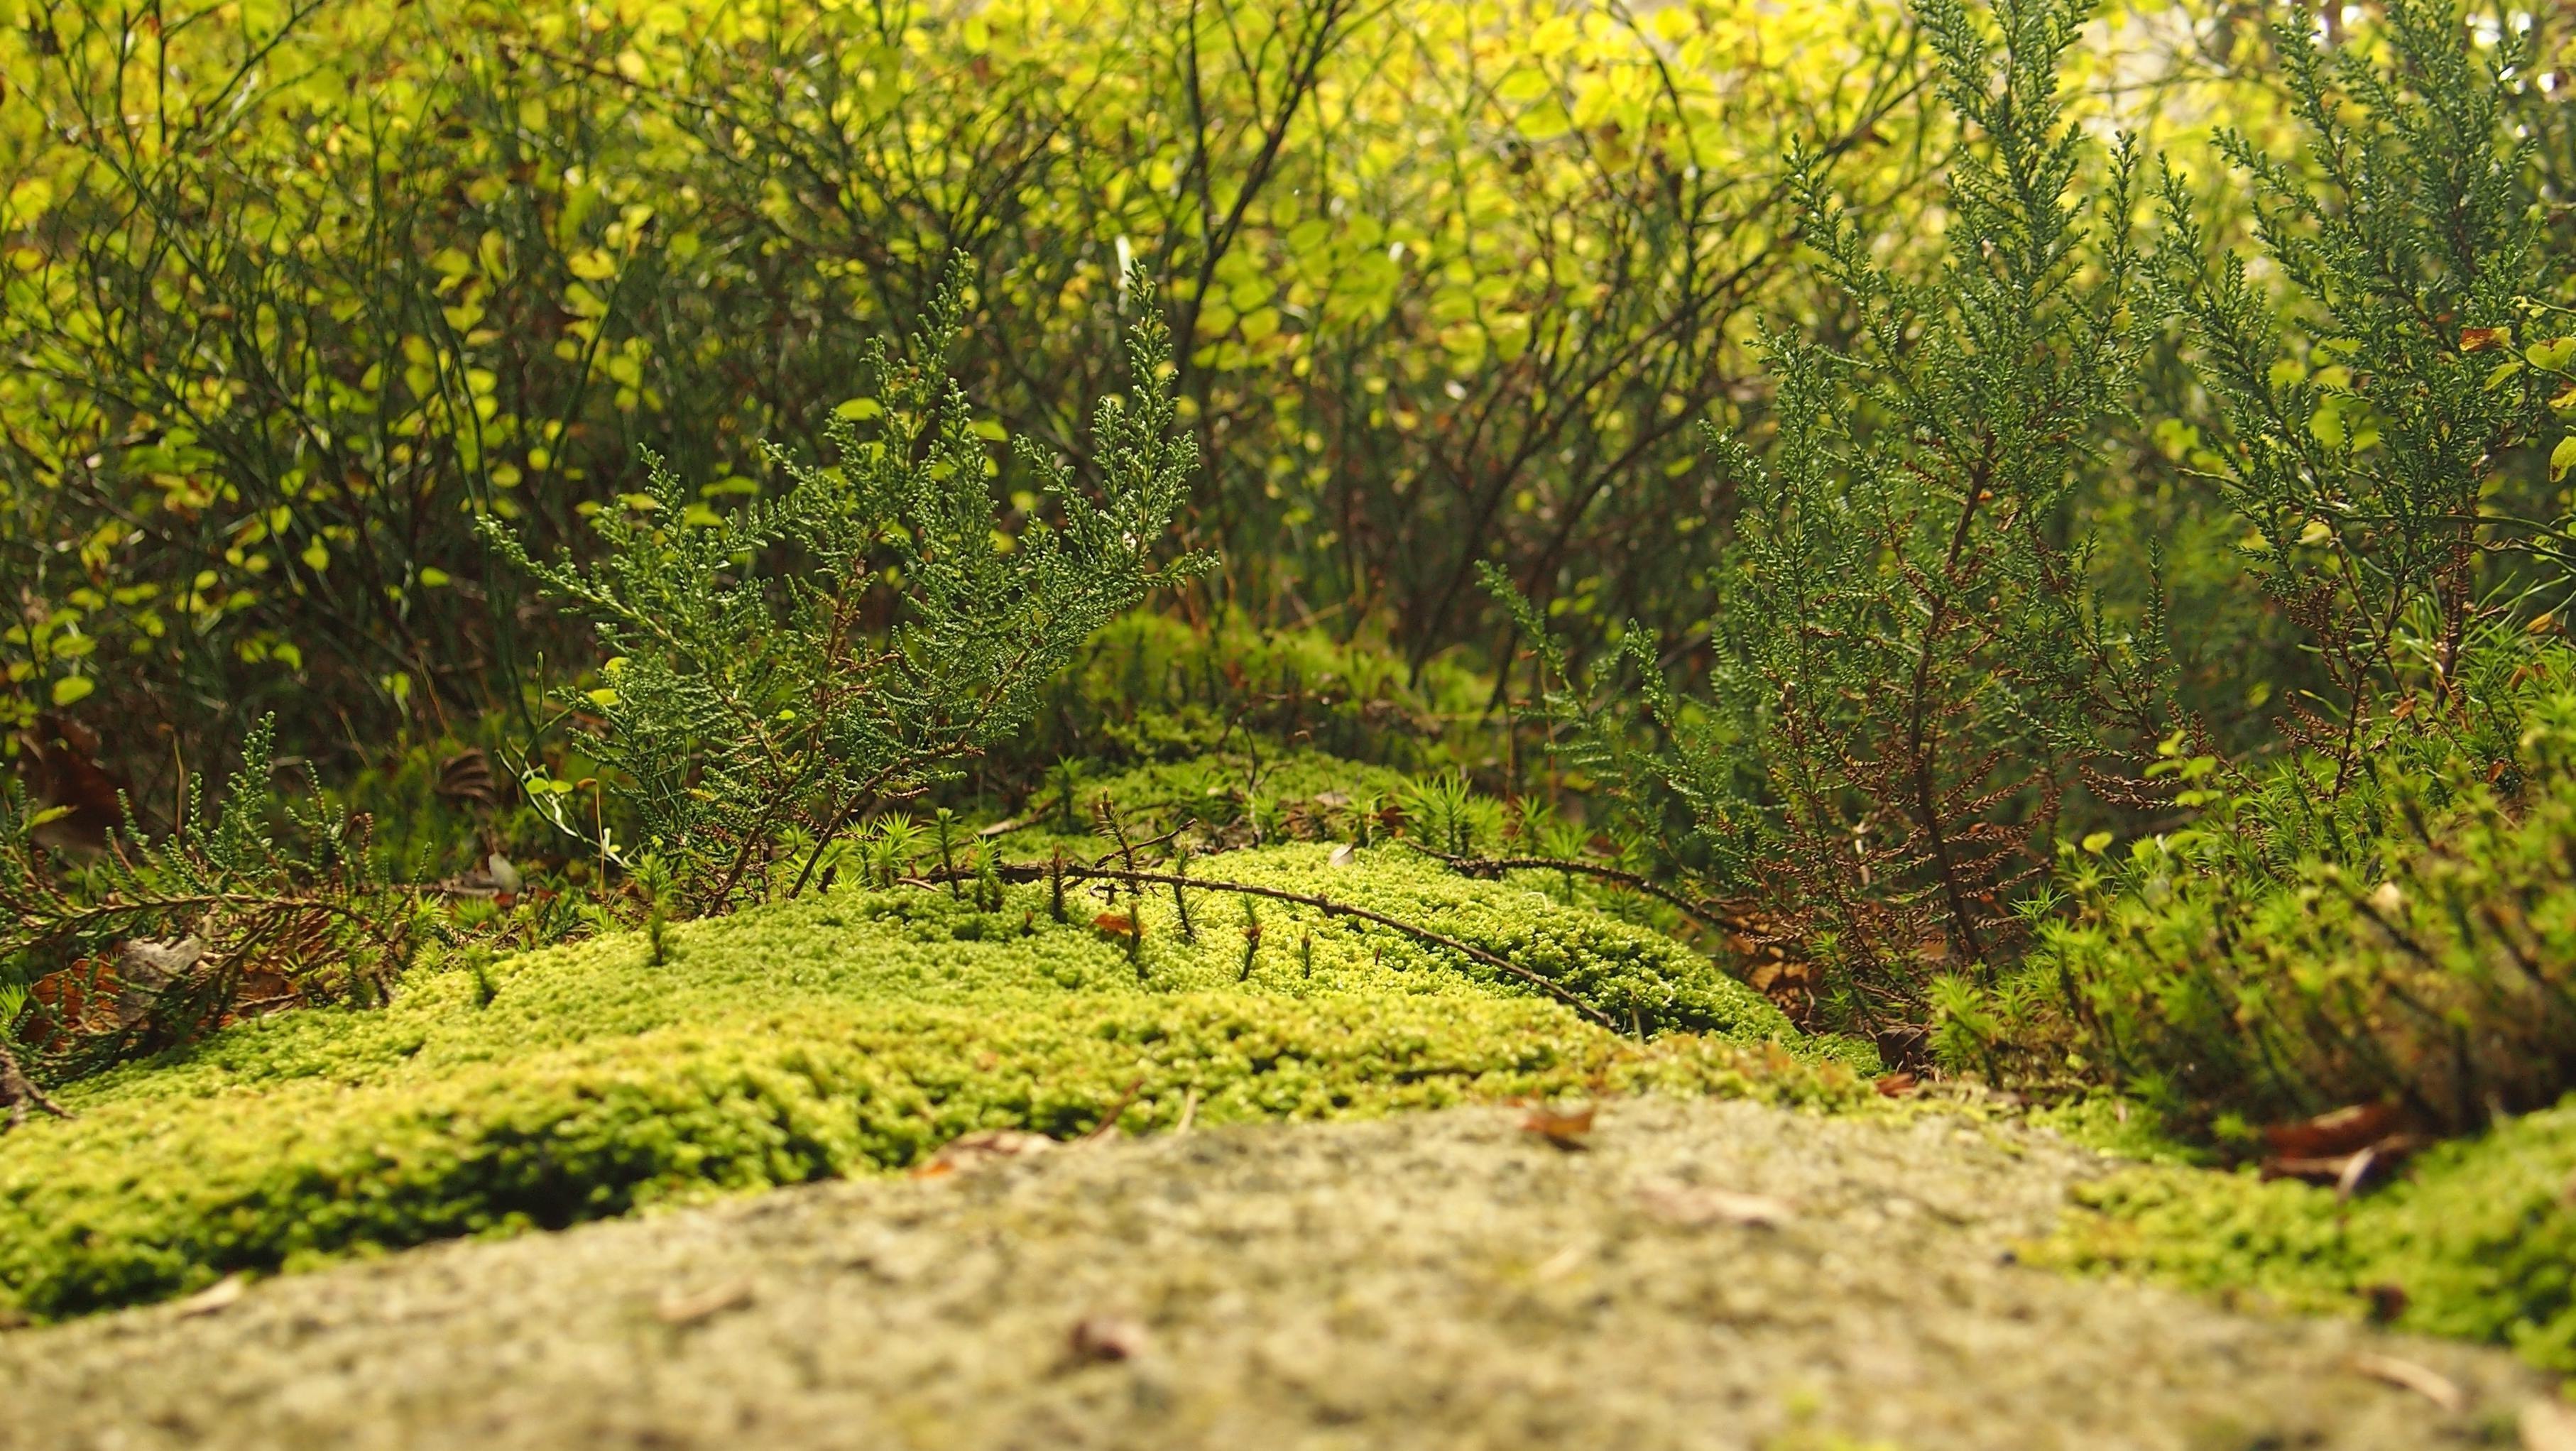 kostenlose bild landschaft natur holz blatt baum moos flechten gras. Black Bedroom Furniture Sets. Home Design Ideas